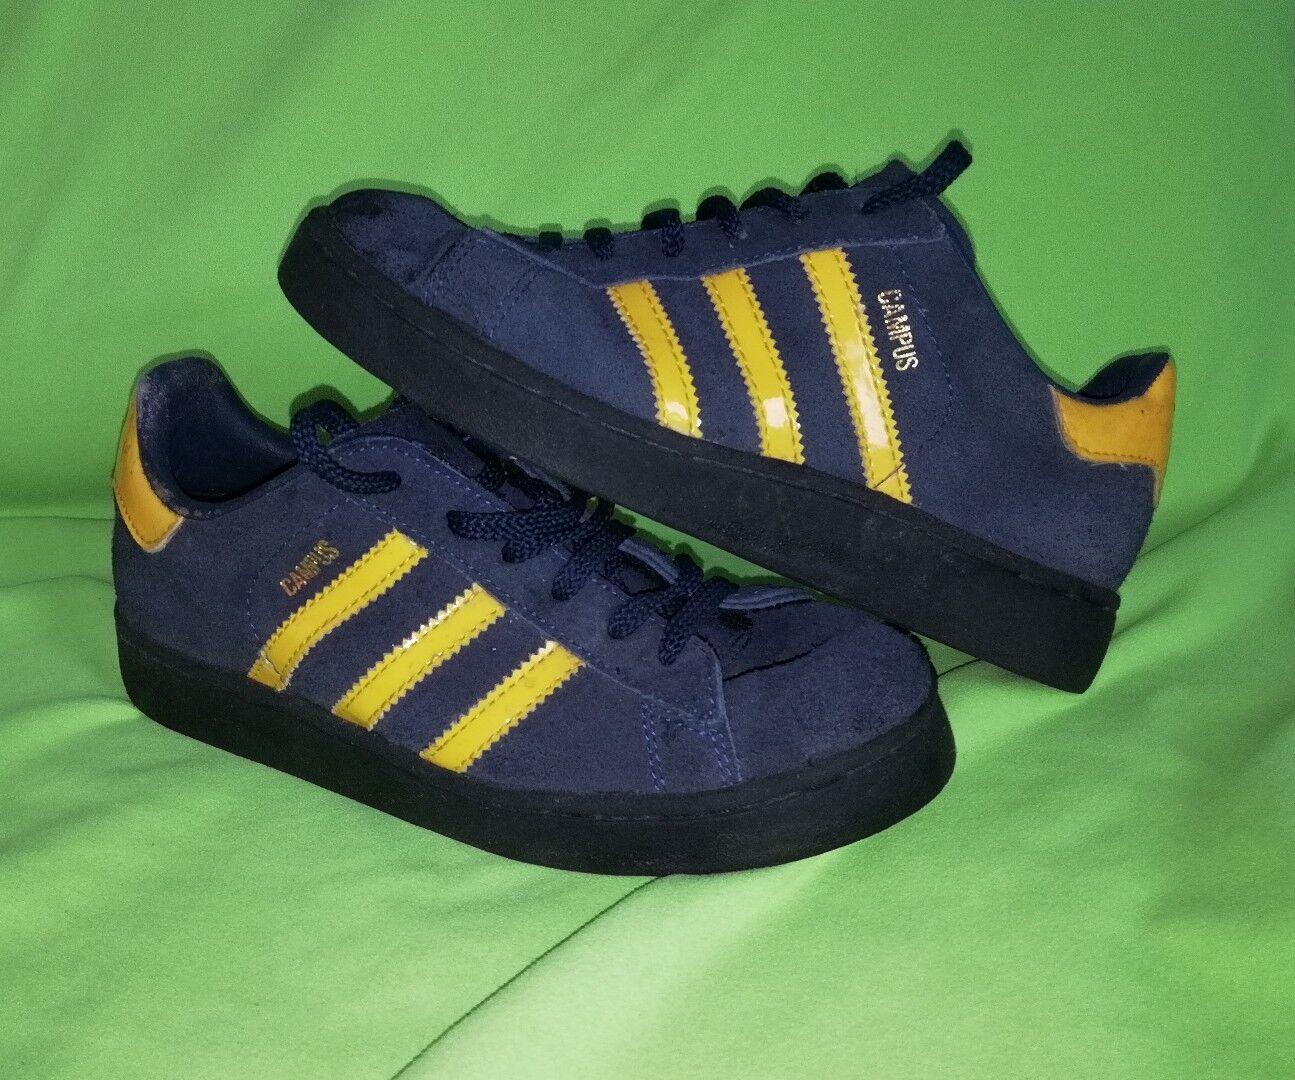 Adidas Original Campus 1996 RARE Deadstock trainers, Taille 5 UK  VINTAGE